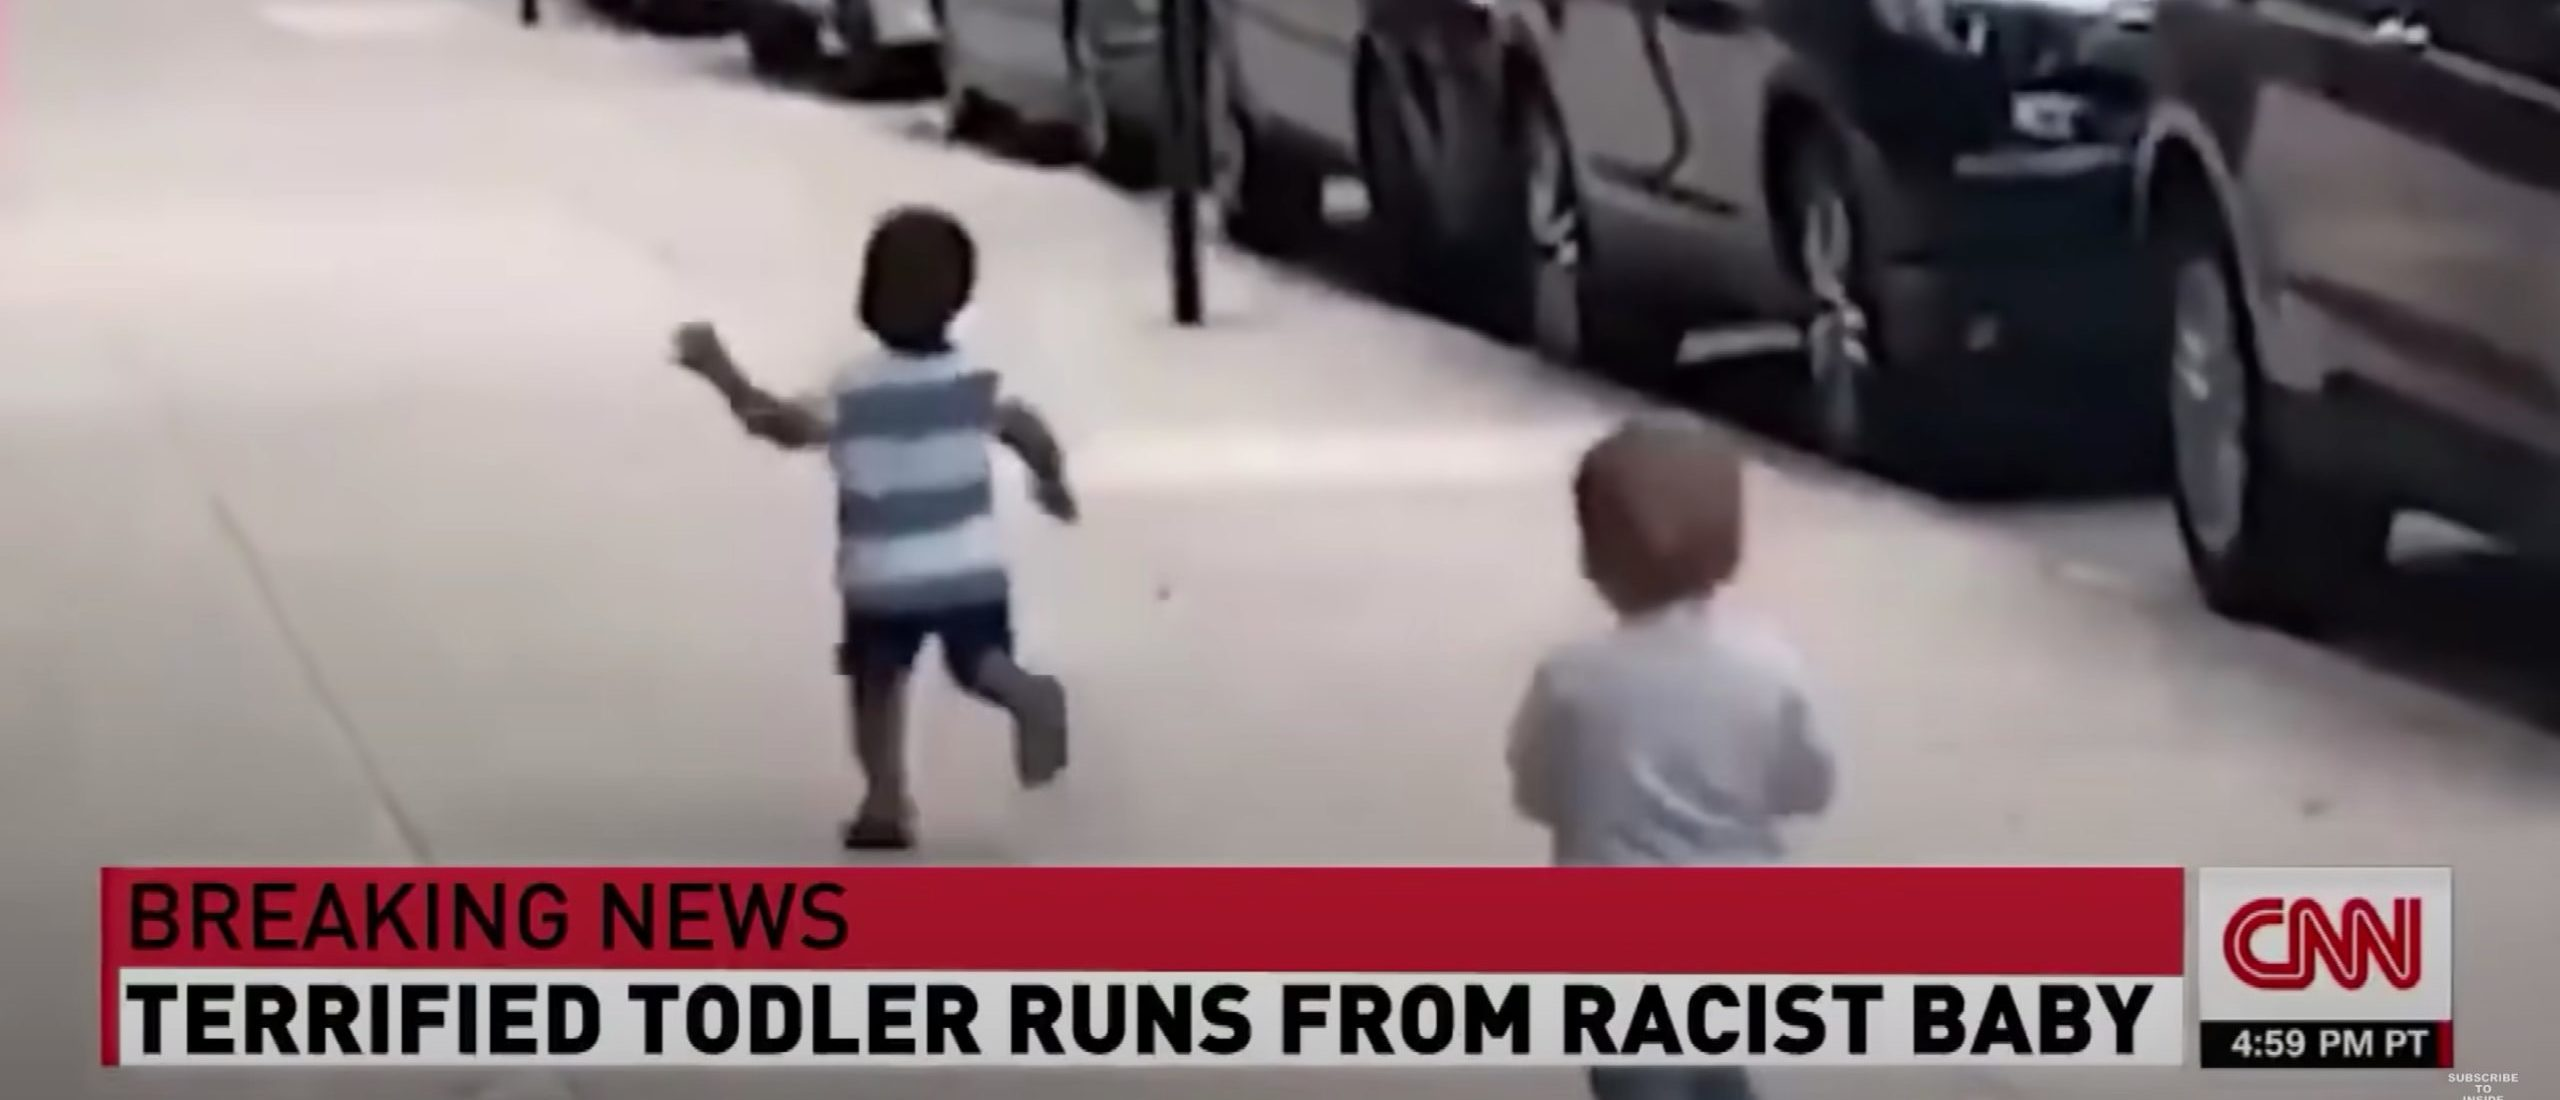 Donald Trump, Trump Campaign And Meme Creator Carpe Donktum Sued Over CNN Toddler Video